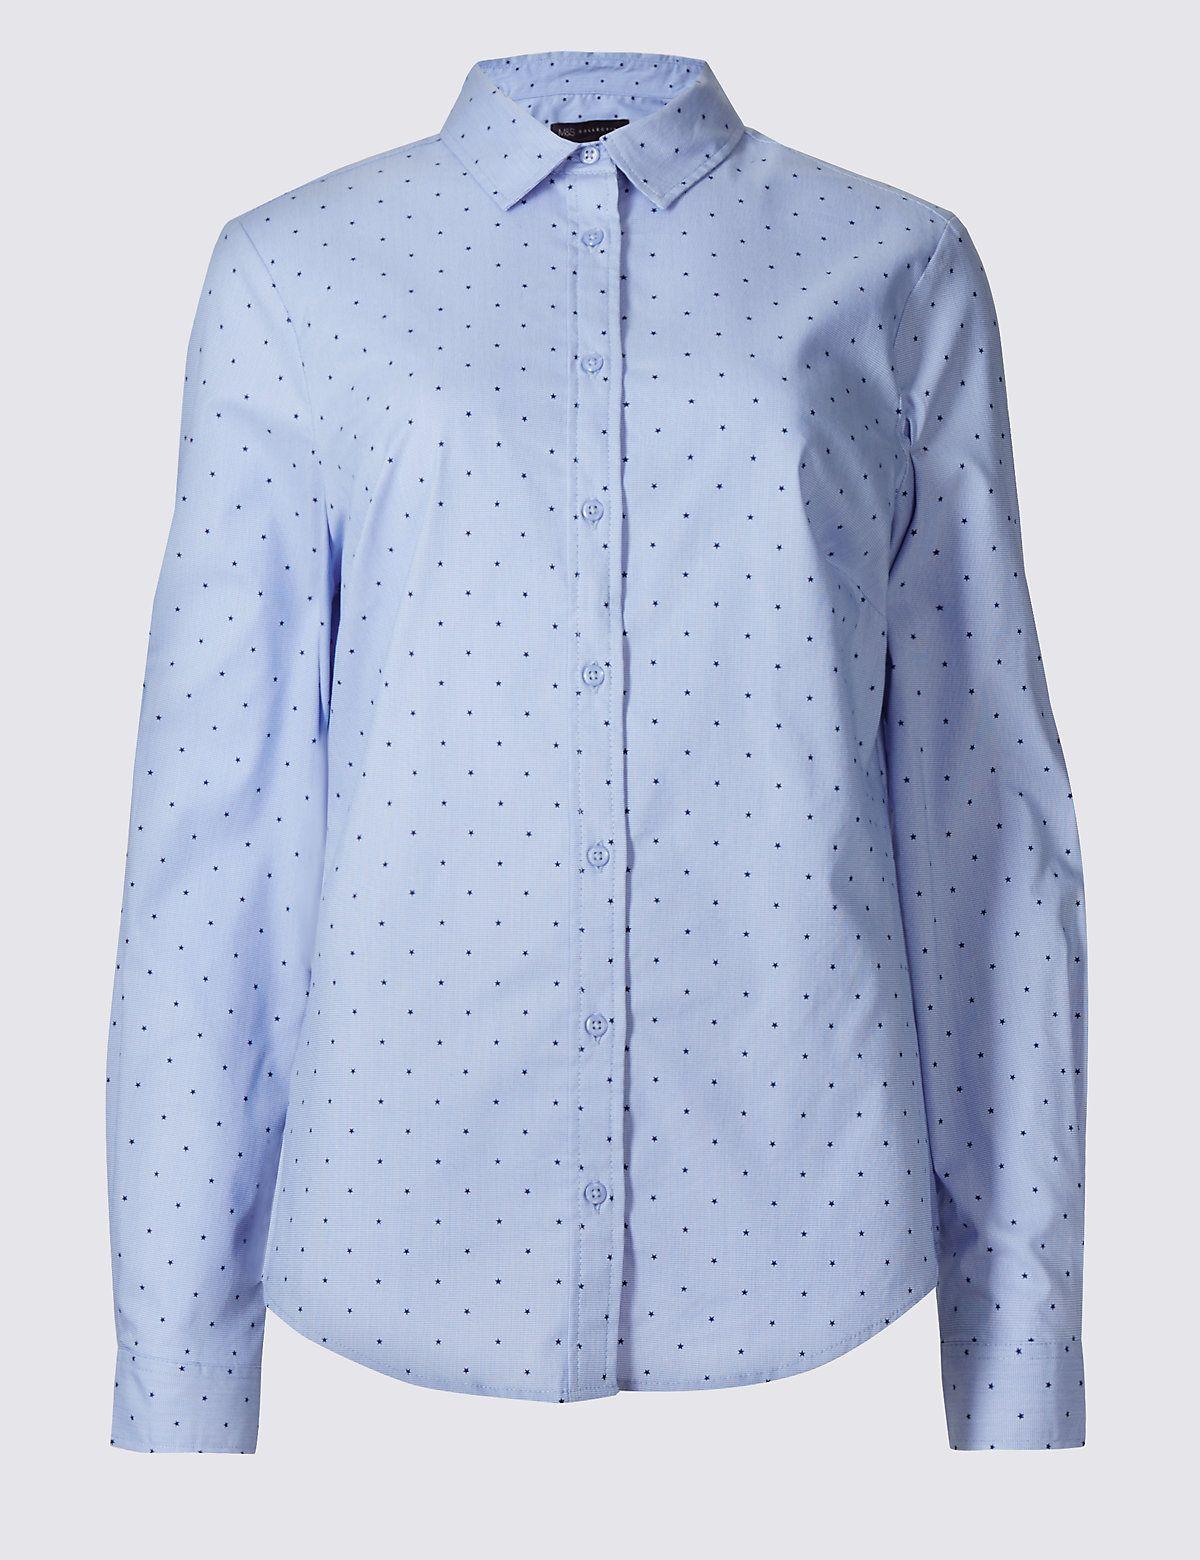 86602ba3 Cotton Rich Star Print Fuller Bust Shirt | Everyday outfits | Shirts ...